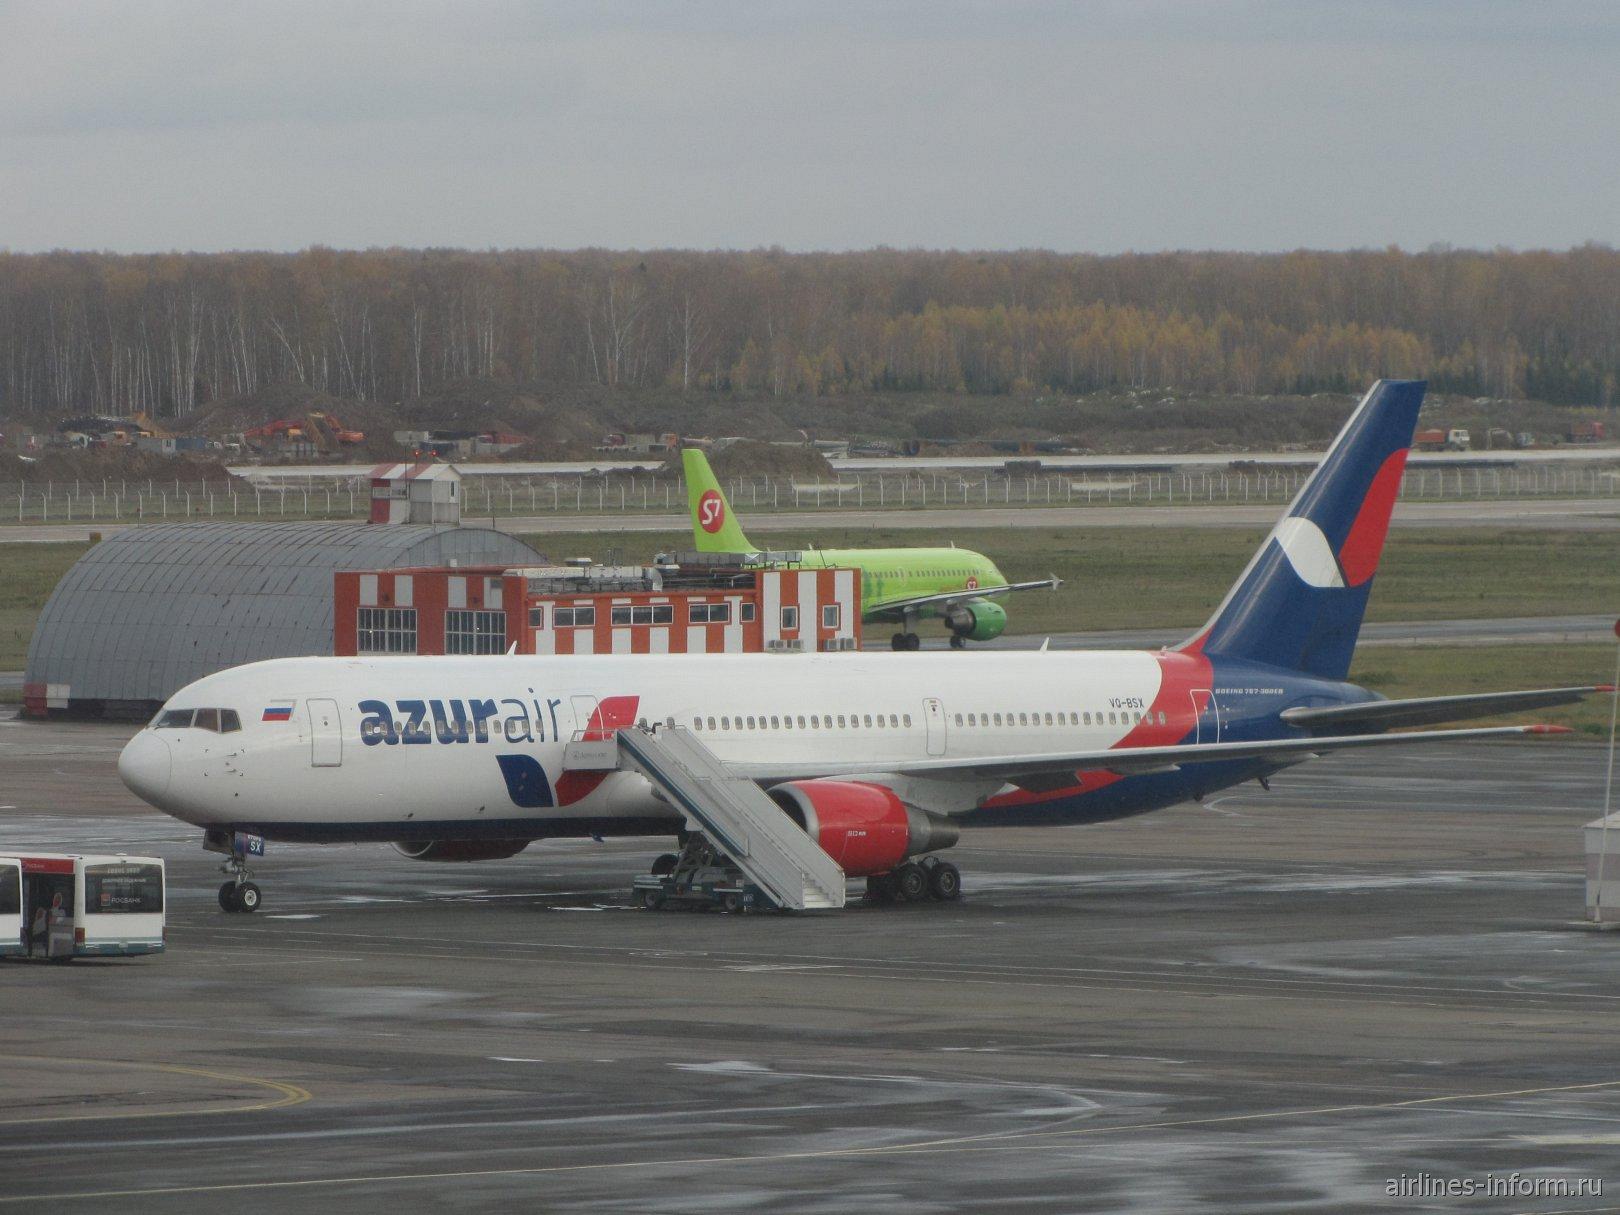 Боинг-767-300 авиакомпании Azur Air в аэропорту Домодедово